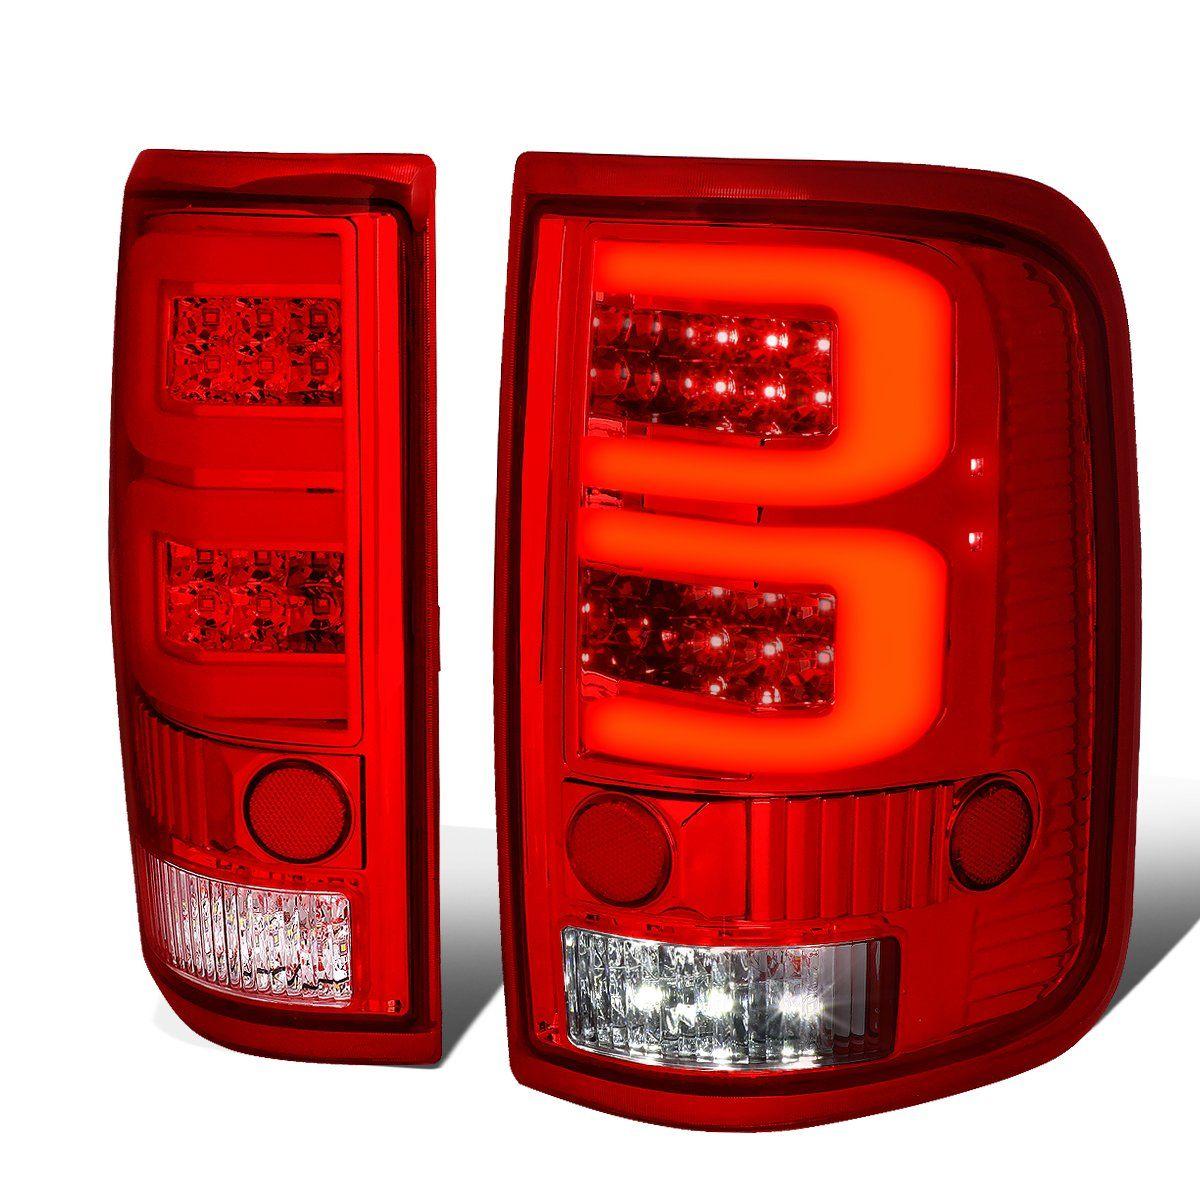 04 08 Ford F150 Lobo Dual Led C Bar Rear Brake Tail Lights Red Housing Tail Light Ford F150 Led